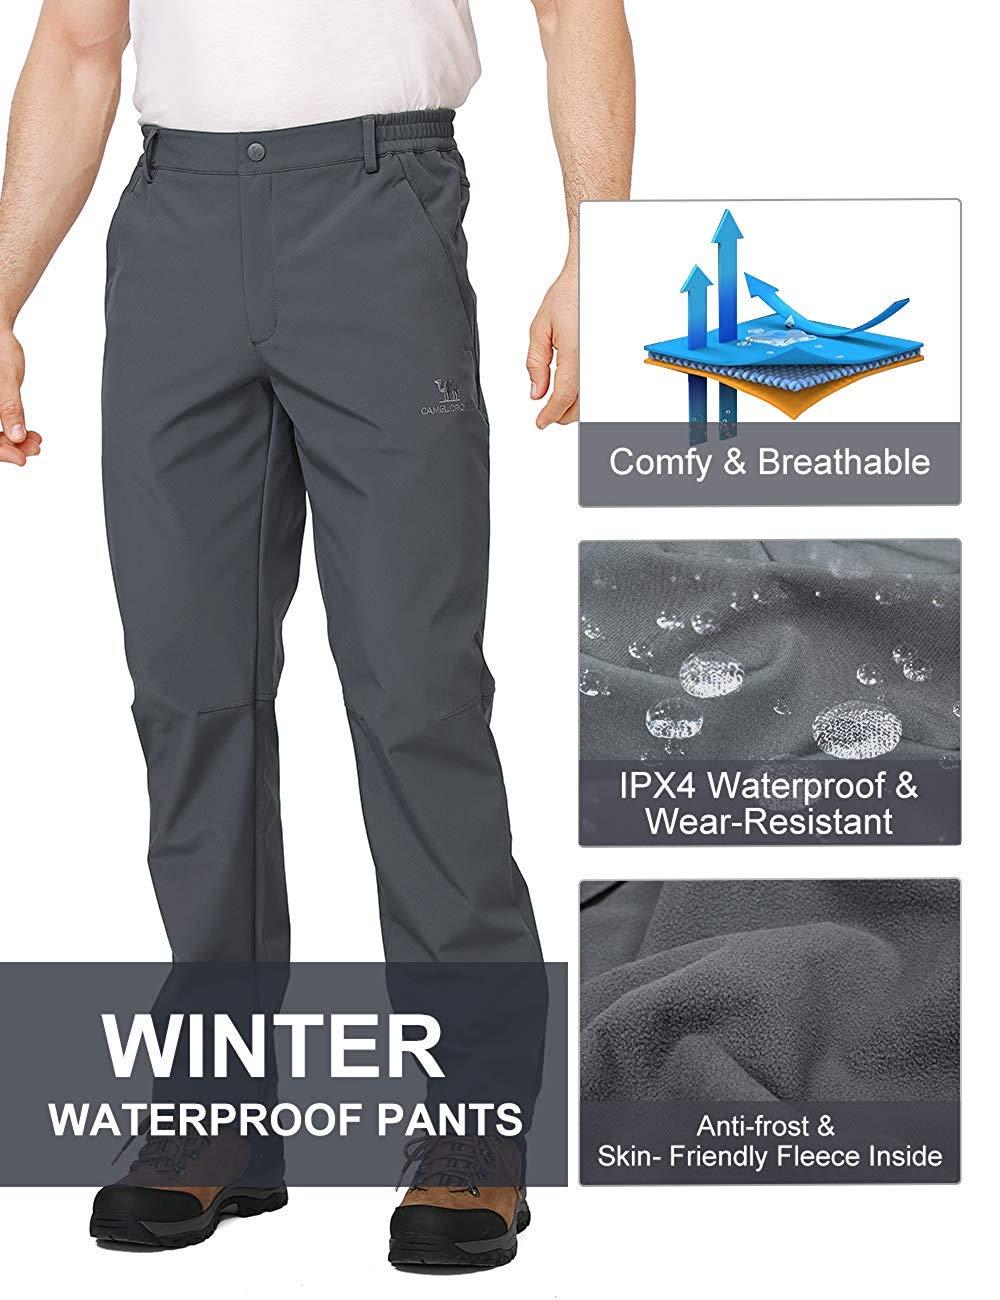 CAMEL CROWN Pantalones Softshell para Hombre Polar Fleece Forrado Impermeable A Prueba De Viento Pantalones de Invierno Pantalones para Trekking Senderismo Esqui Snowboard Deportivos con Bolsillo